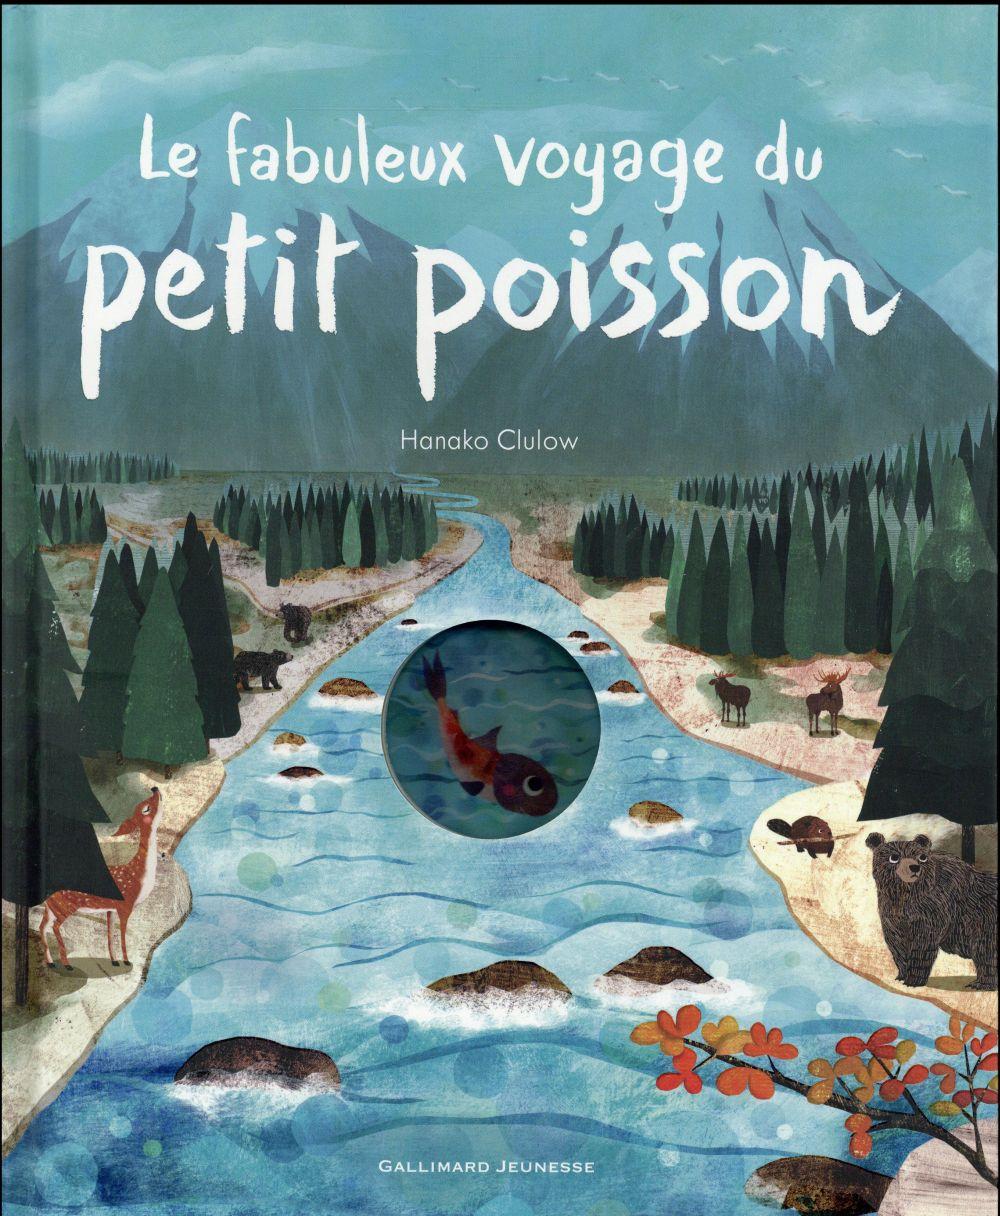 LE FABULEUX VOYAGE DU PETIT POISSON Hegarty Patricia Gallimard-Jeunesse